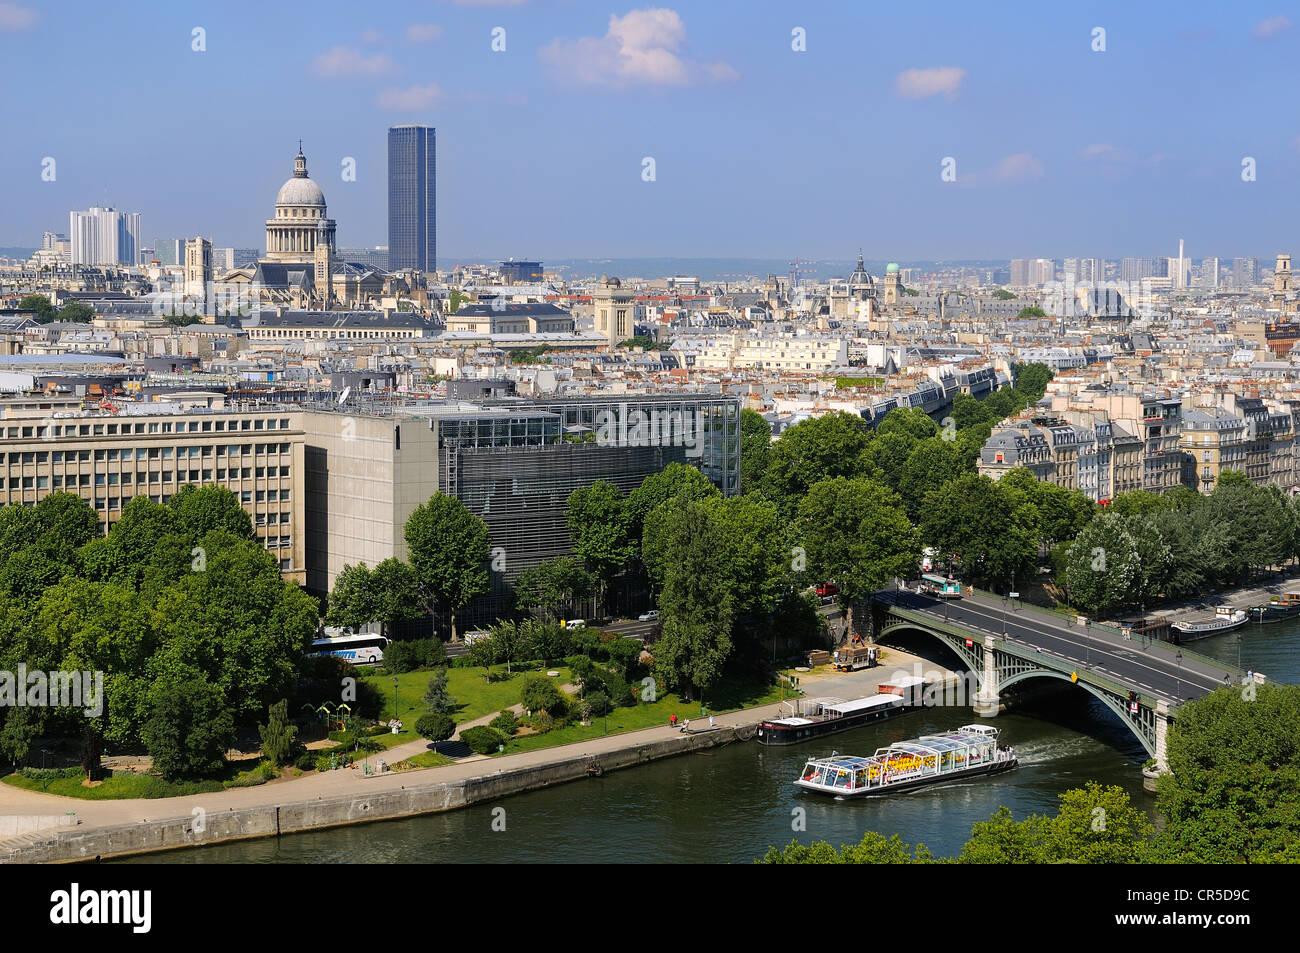 France, Paris, the banks of the Seine River UNESCO World Heritage, the Arab World Institute (Institut du Monde Arabe) - Stock Image